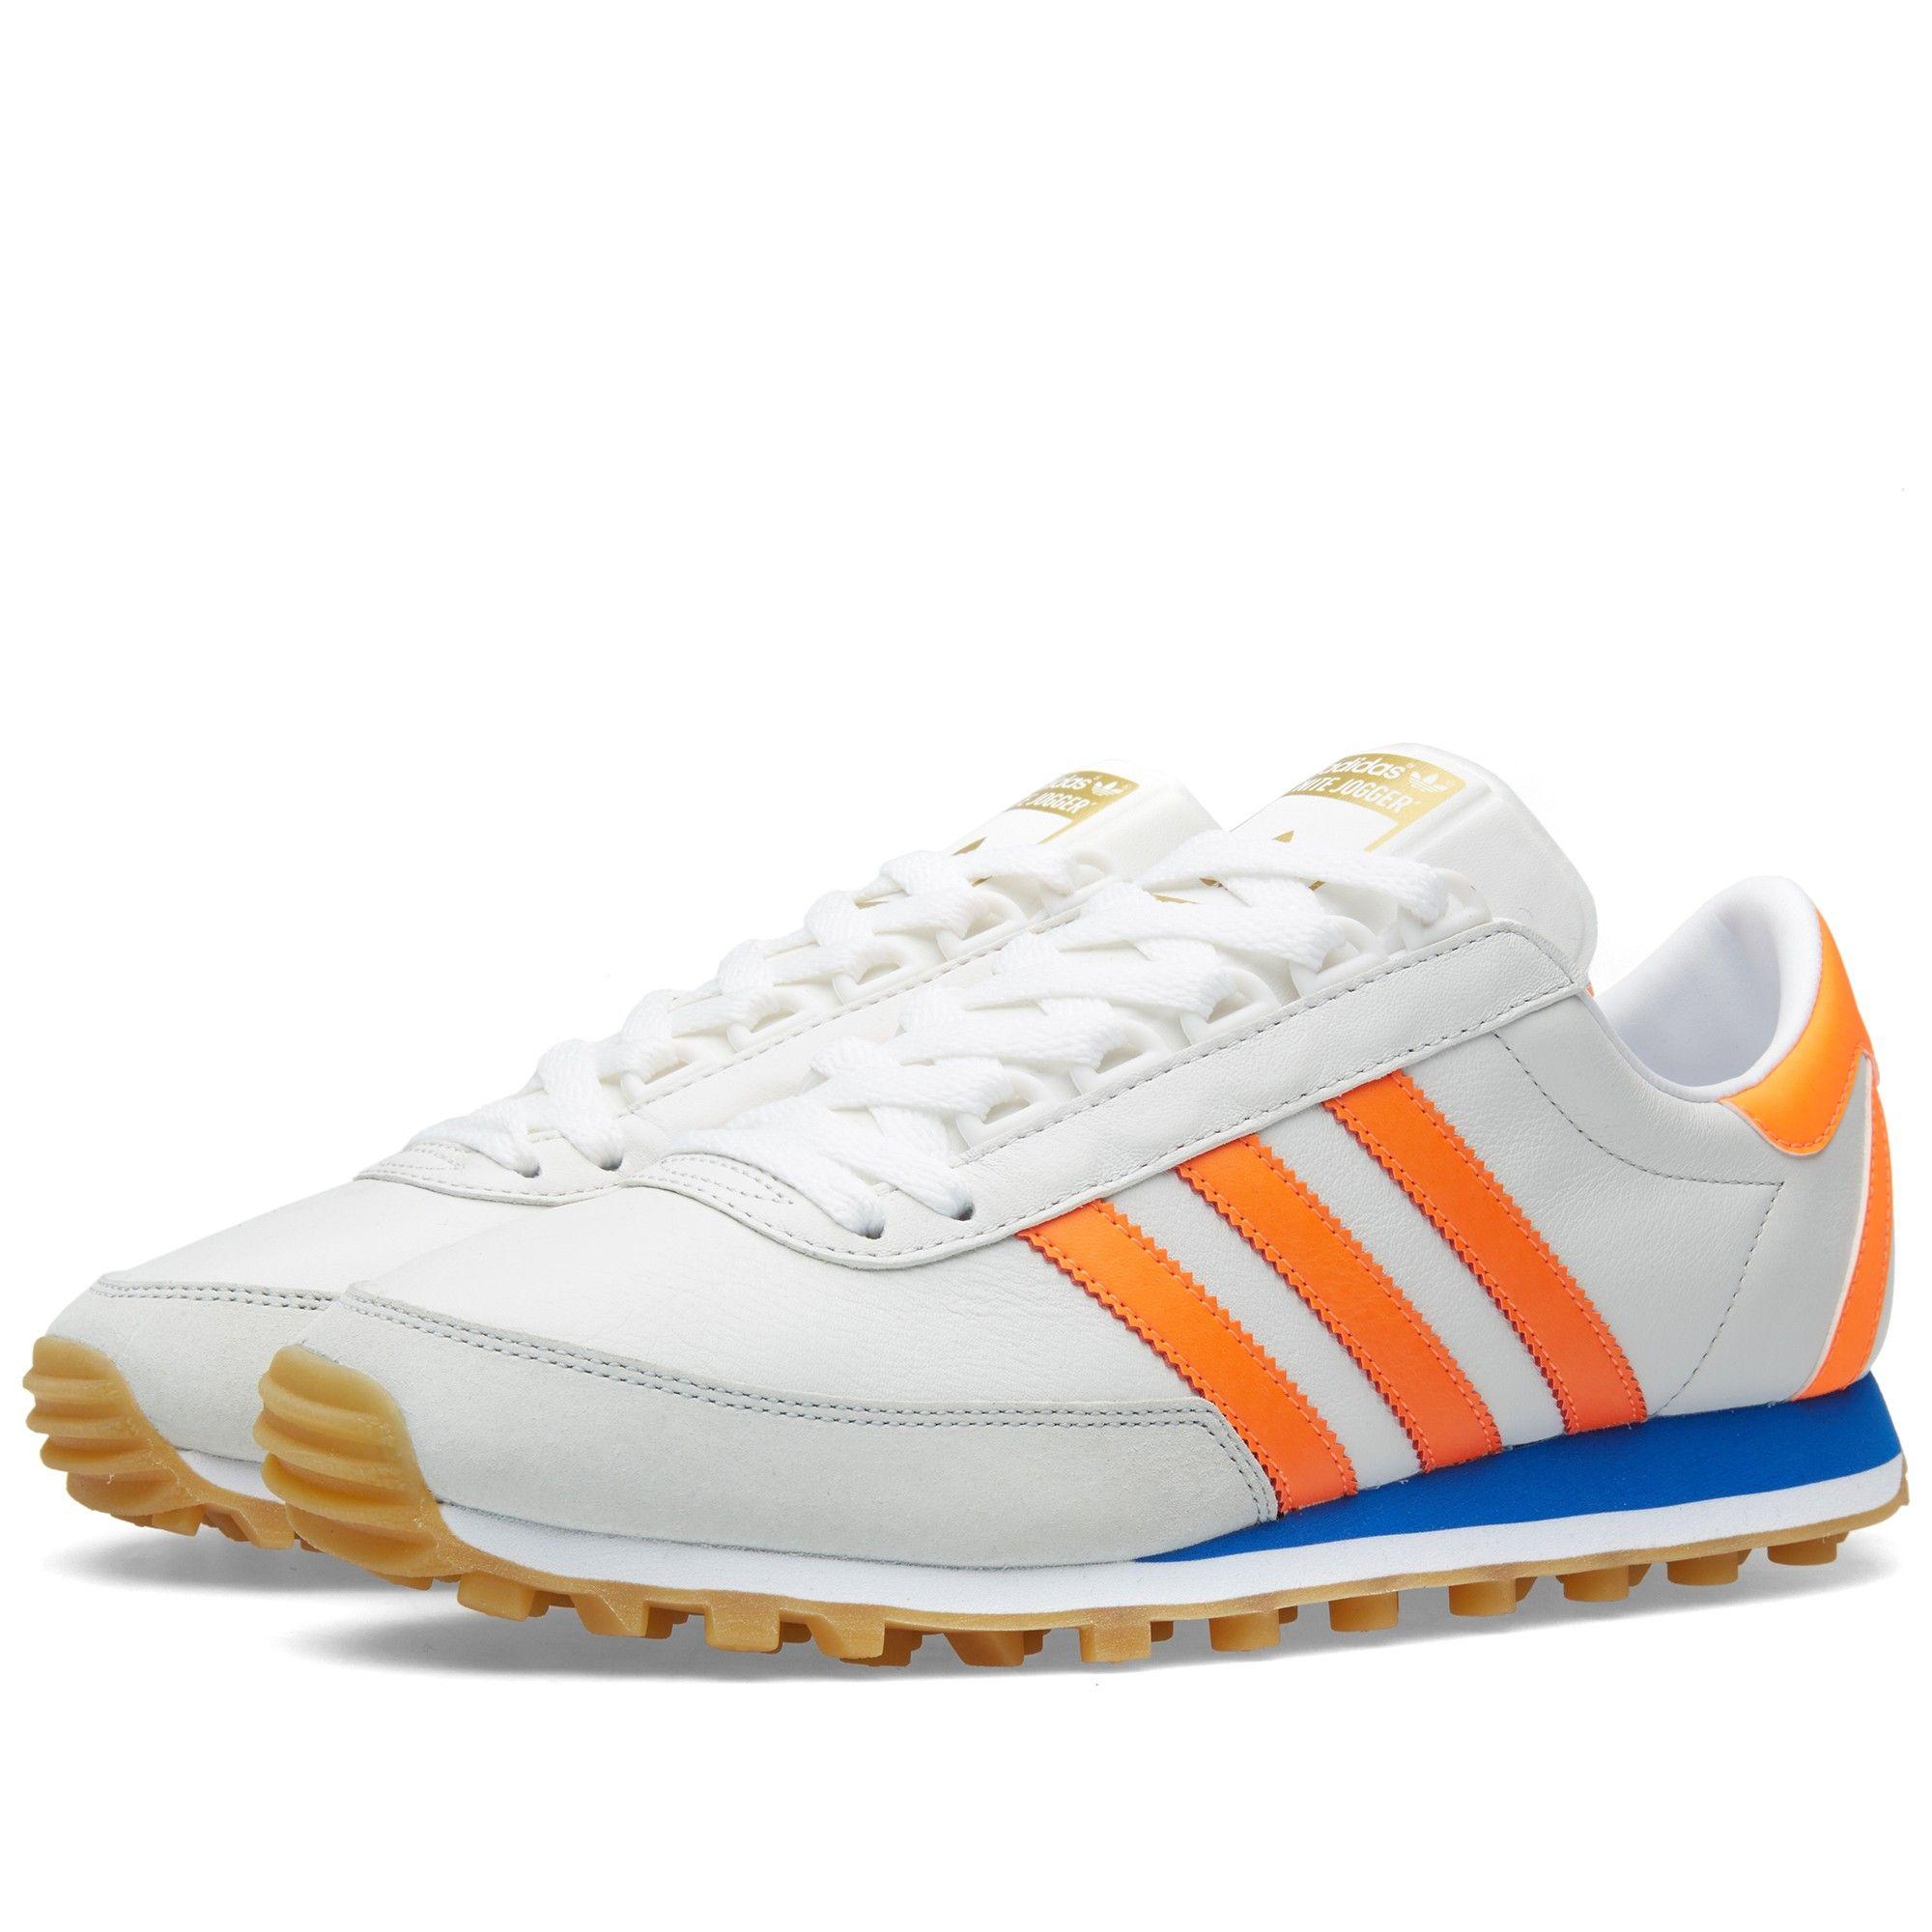 Adidas Nite Jogger OG (Vintage White & Solar Orange